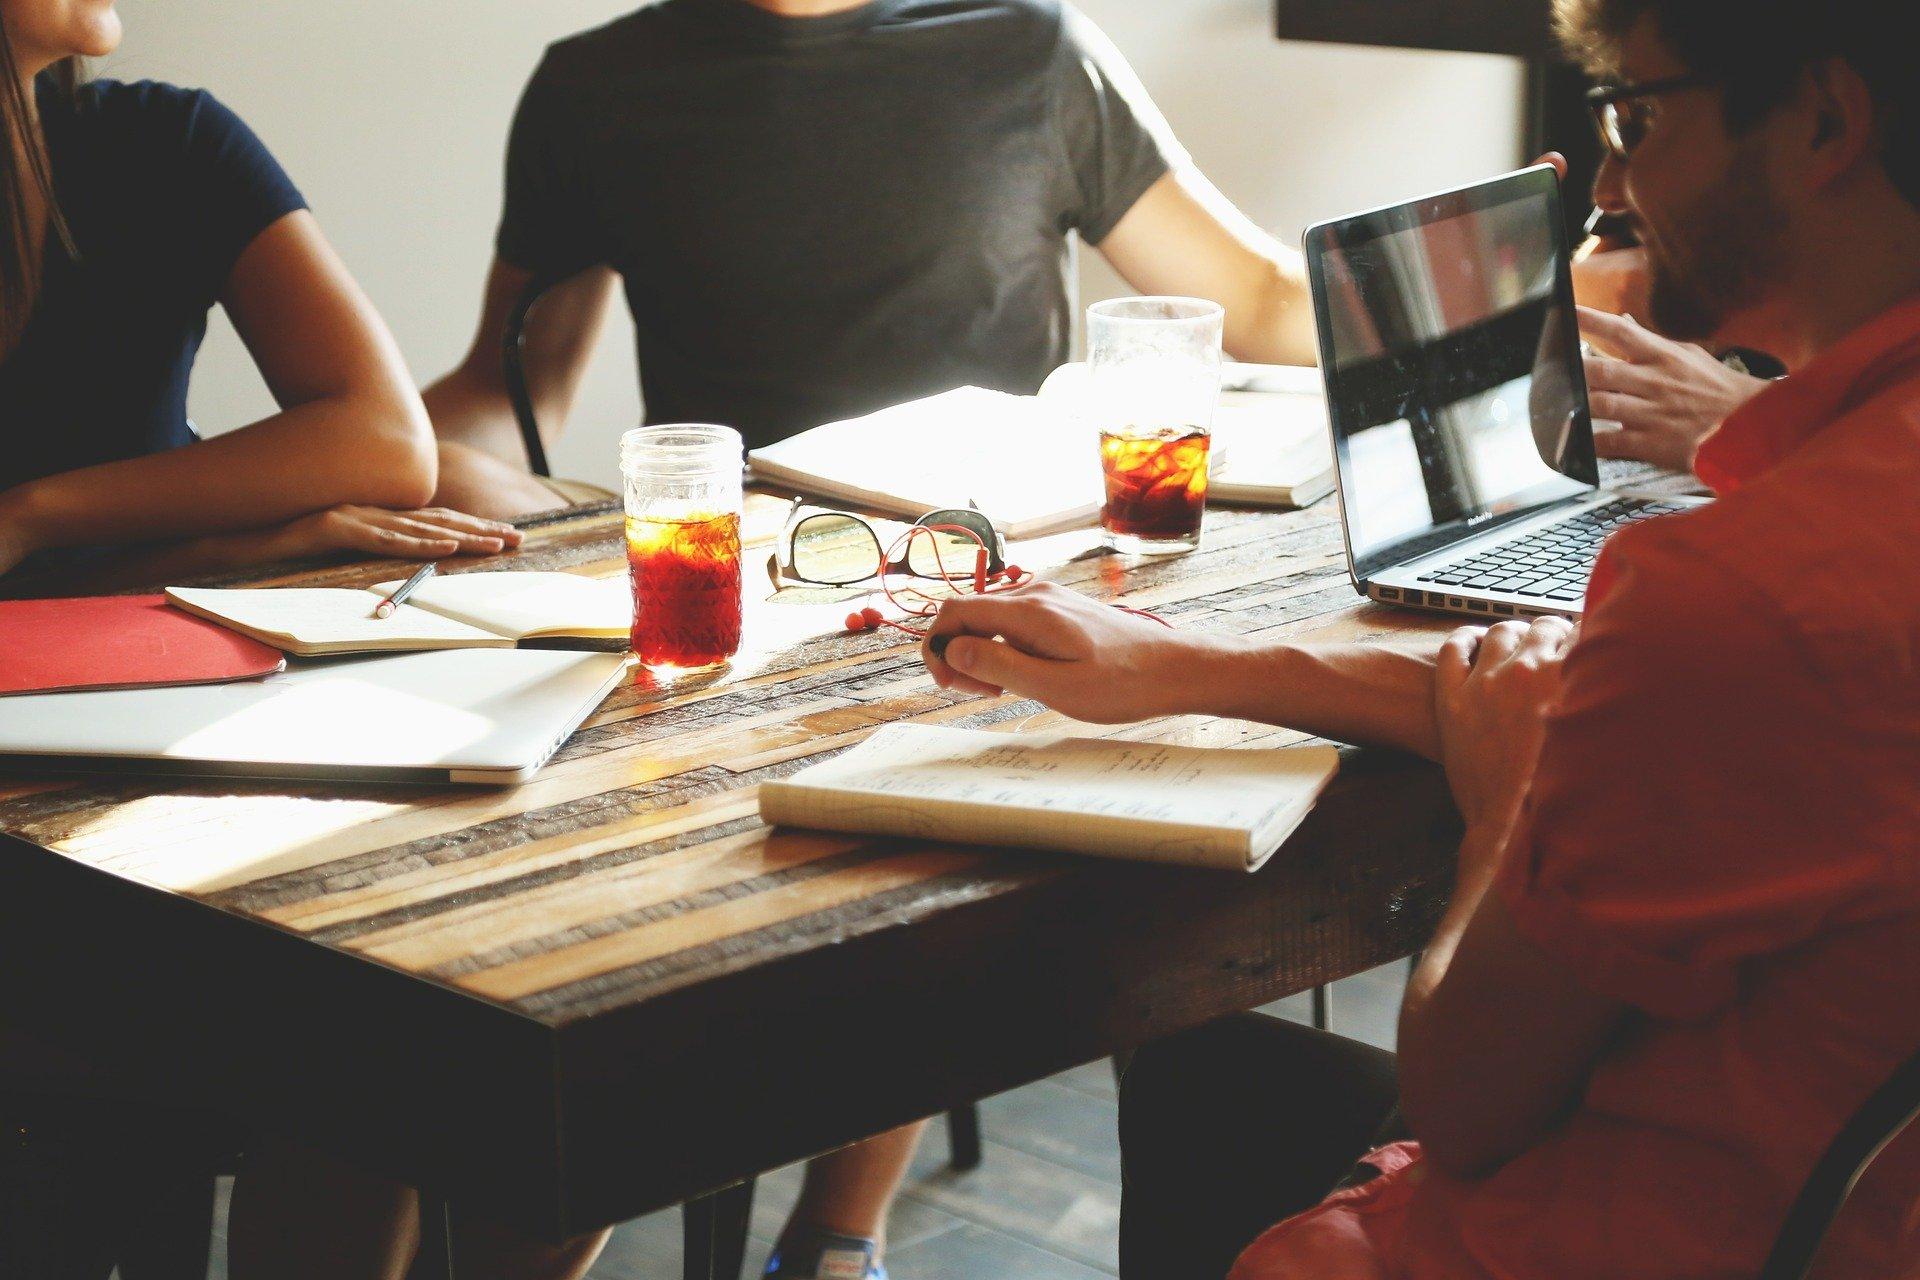 Informal Meeting (Image from Pixabay)